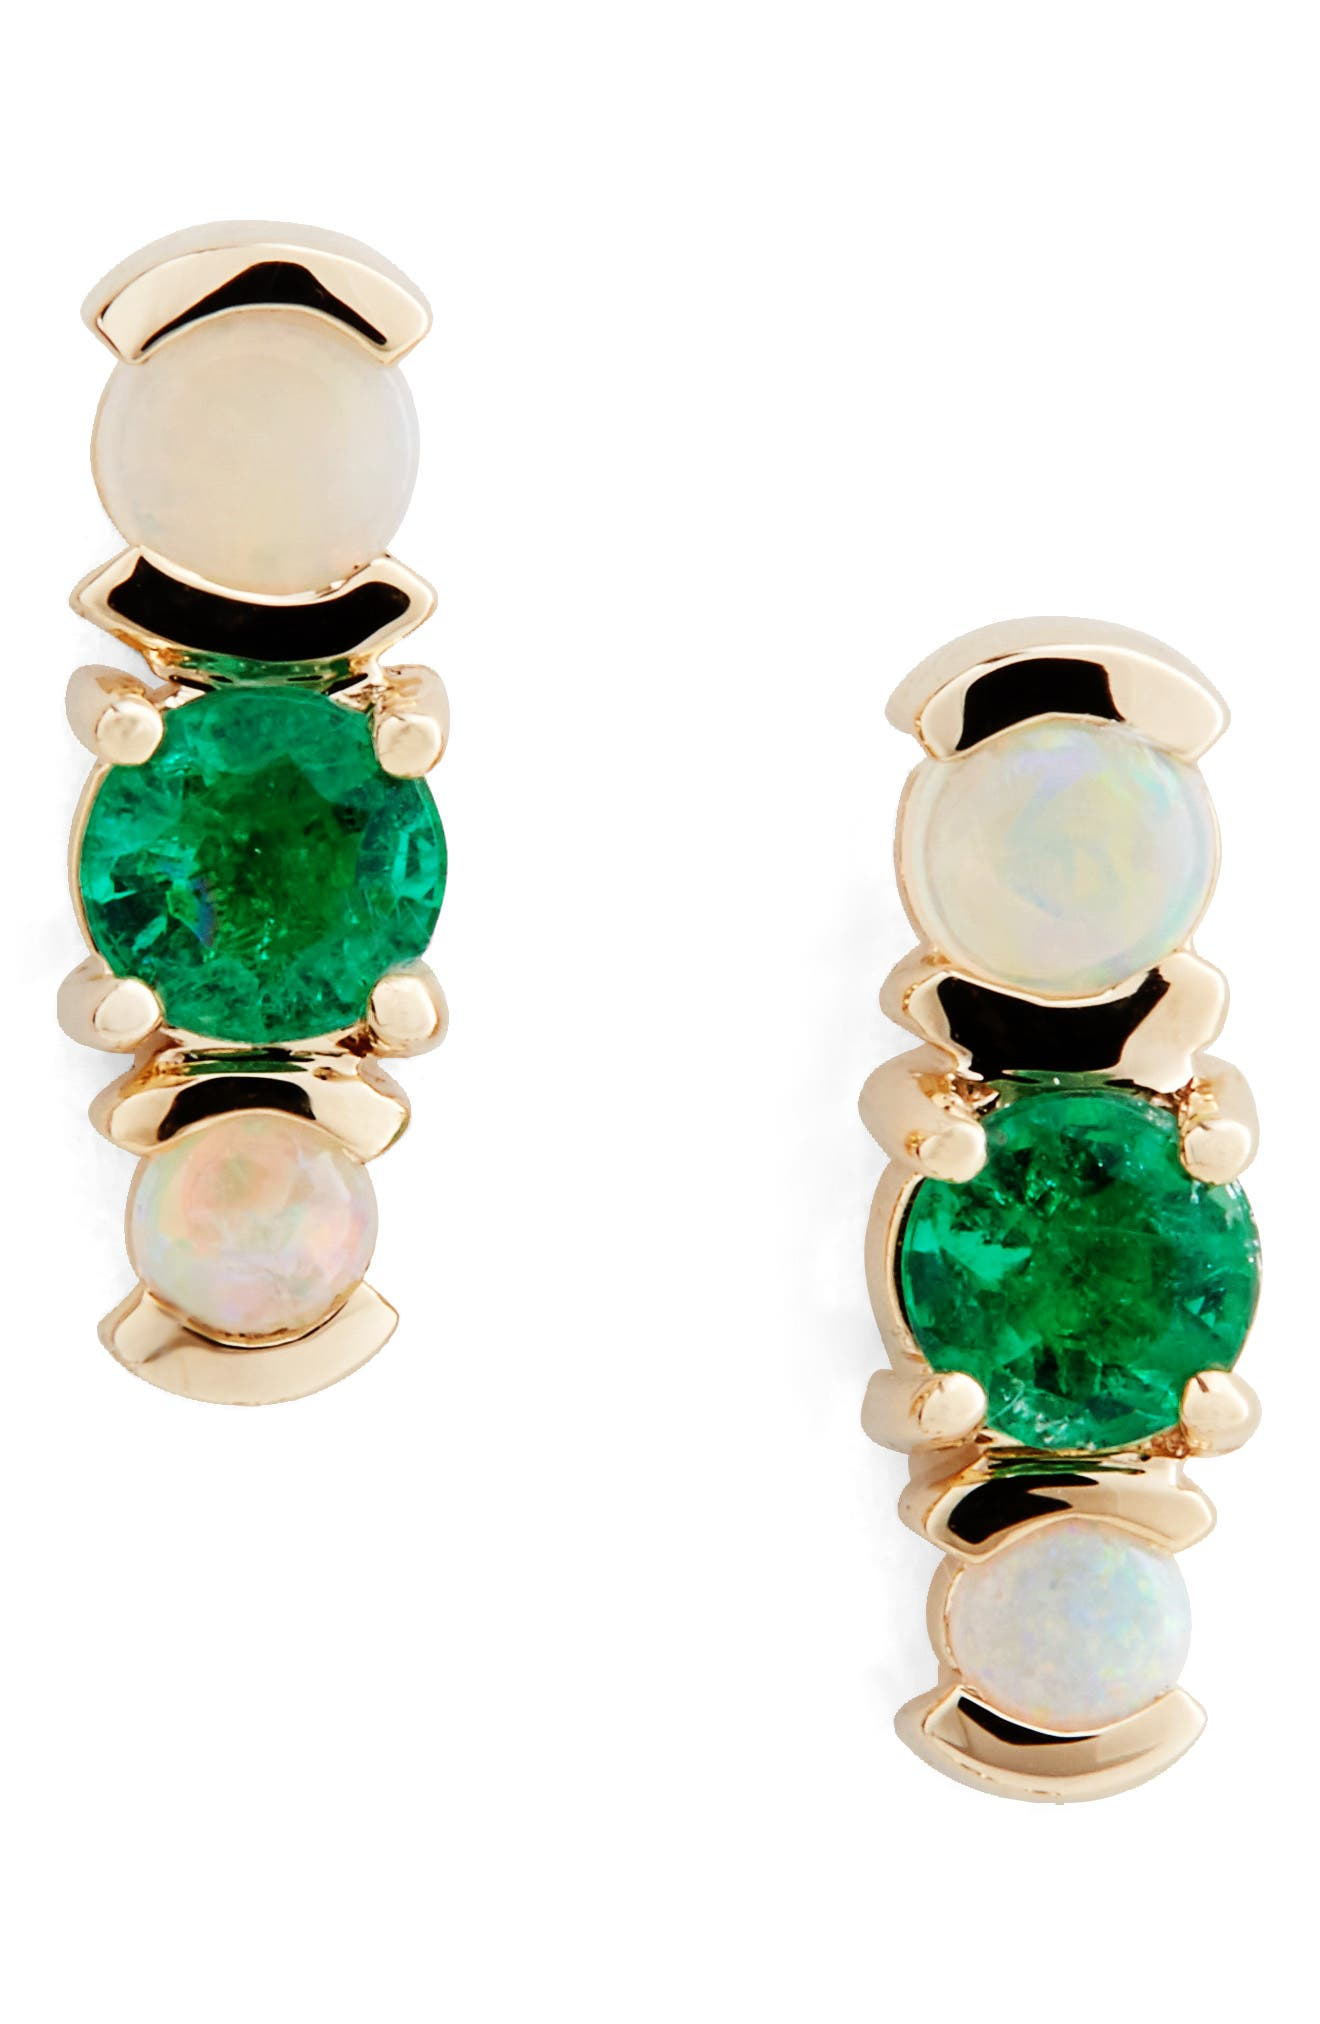 MOCIUN Emerald & Opal Cluster Earrings (Nordstrom Exclusive)